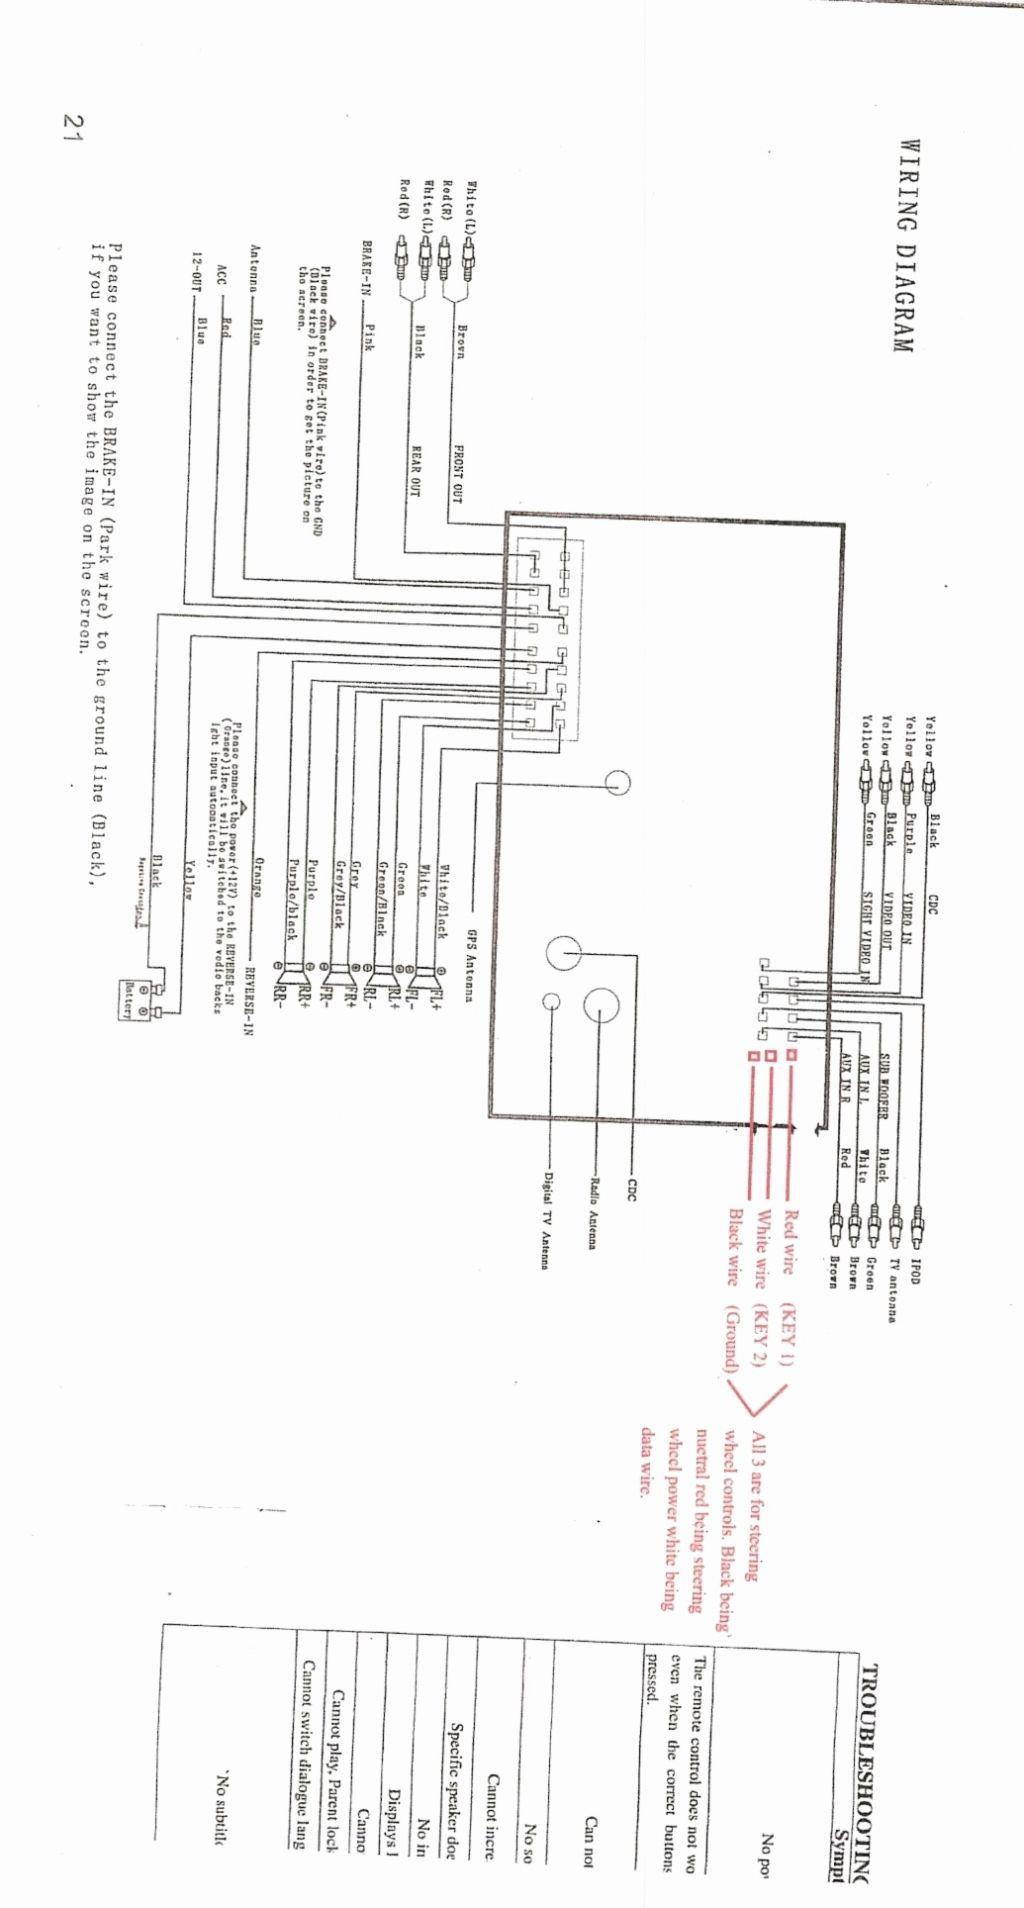 axxess gmos 01 wiring diagram